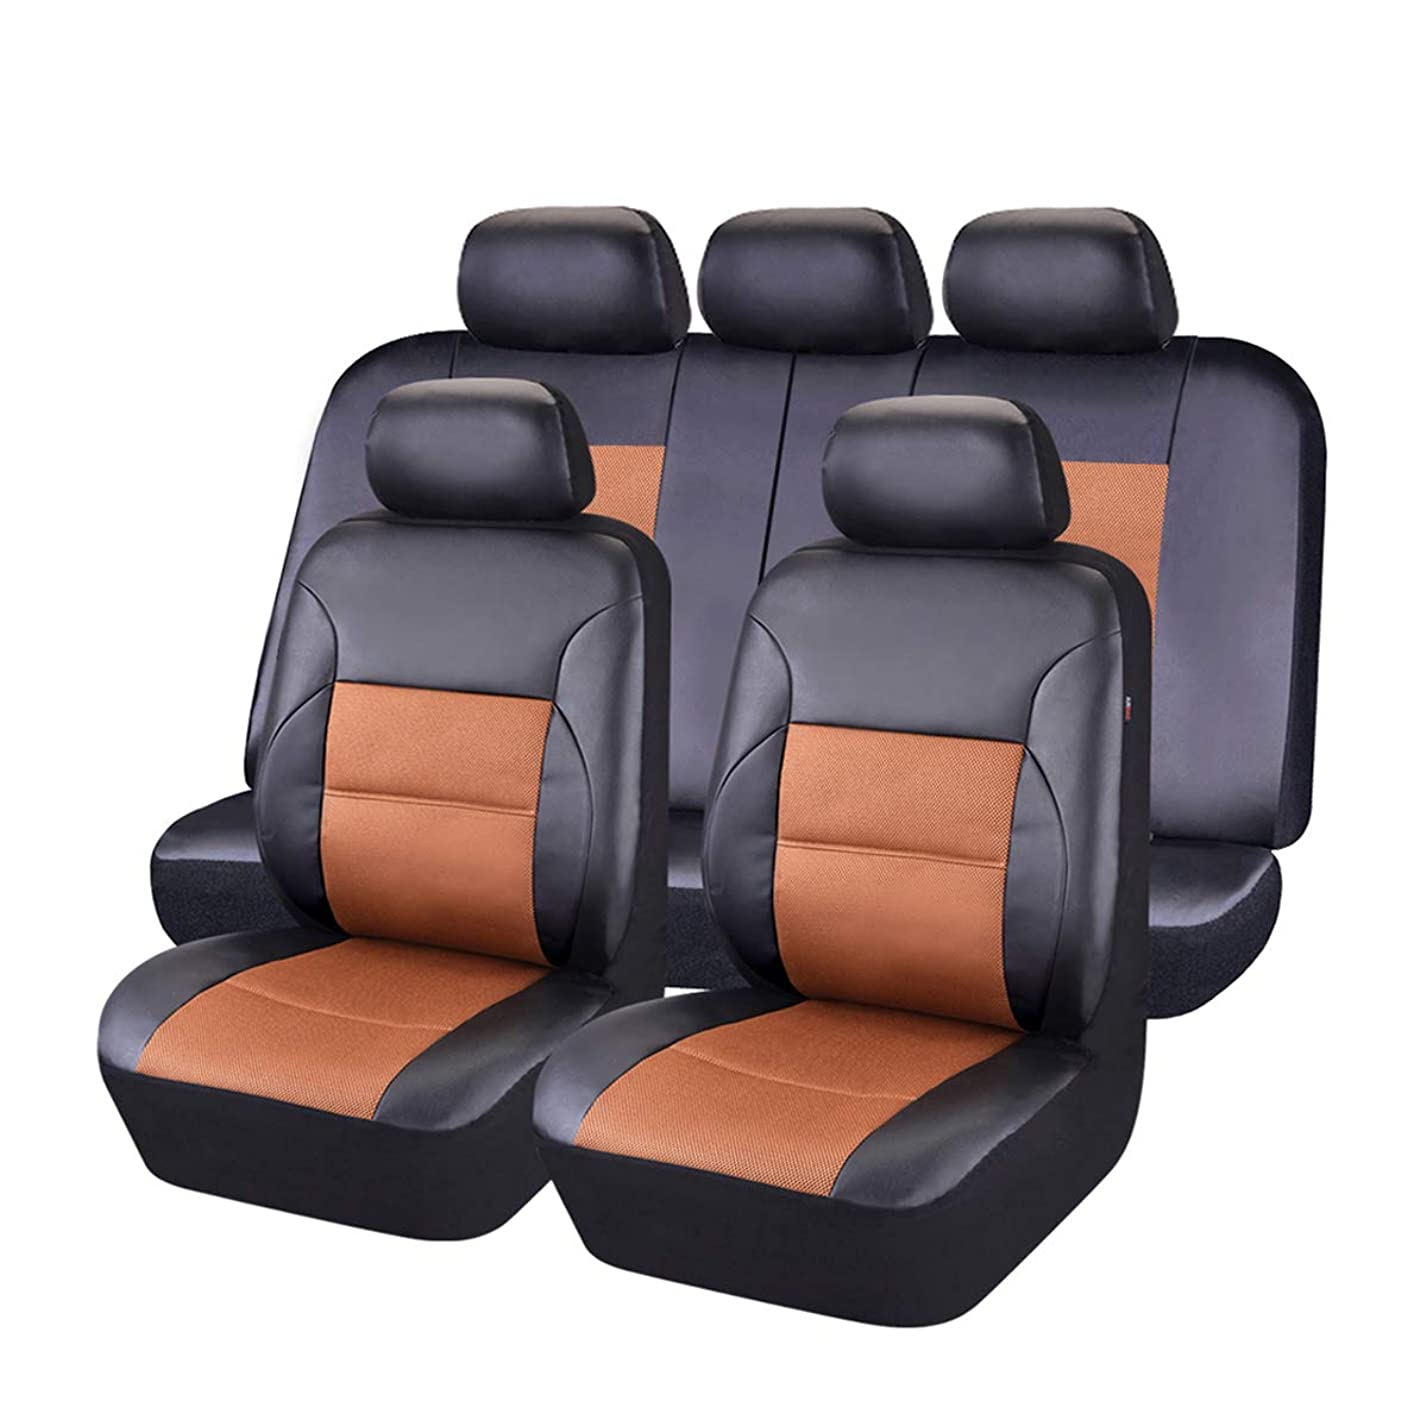 CAR PASS 11 Pieces Leather Universal Car Seat Covers Set - Black and Khaki ec39177608